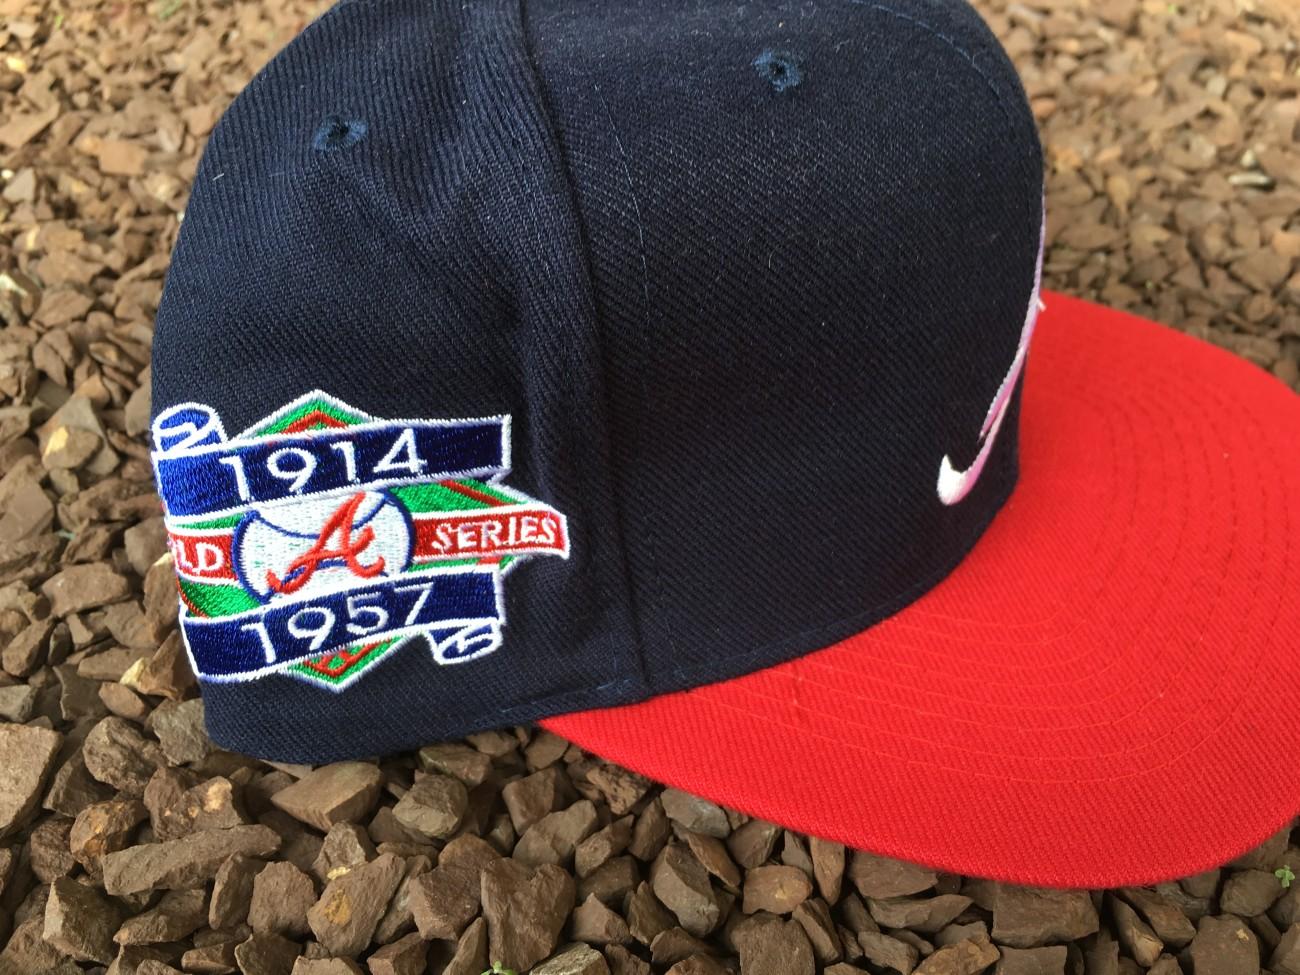 be6572a7 90's Atlanta Braves World Series Champions ANNCO MLB Snapback Hat